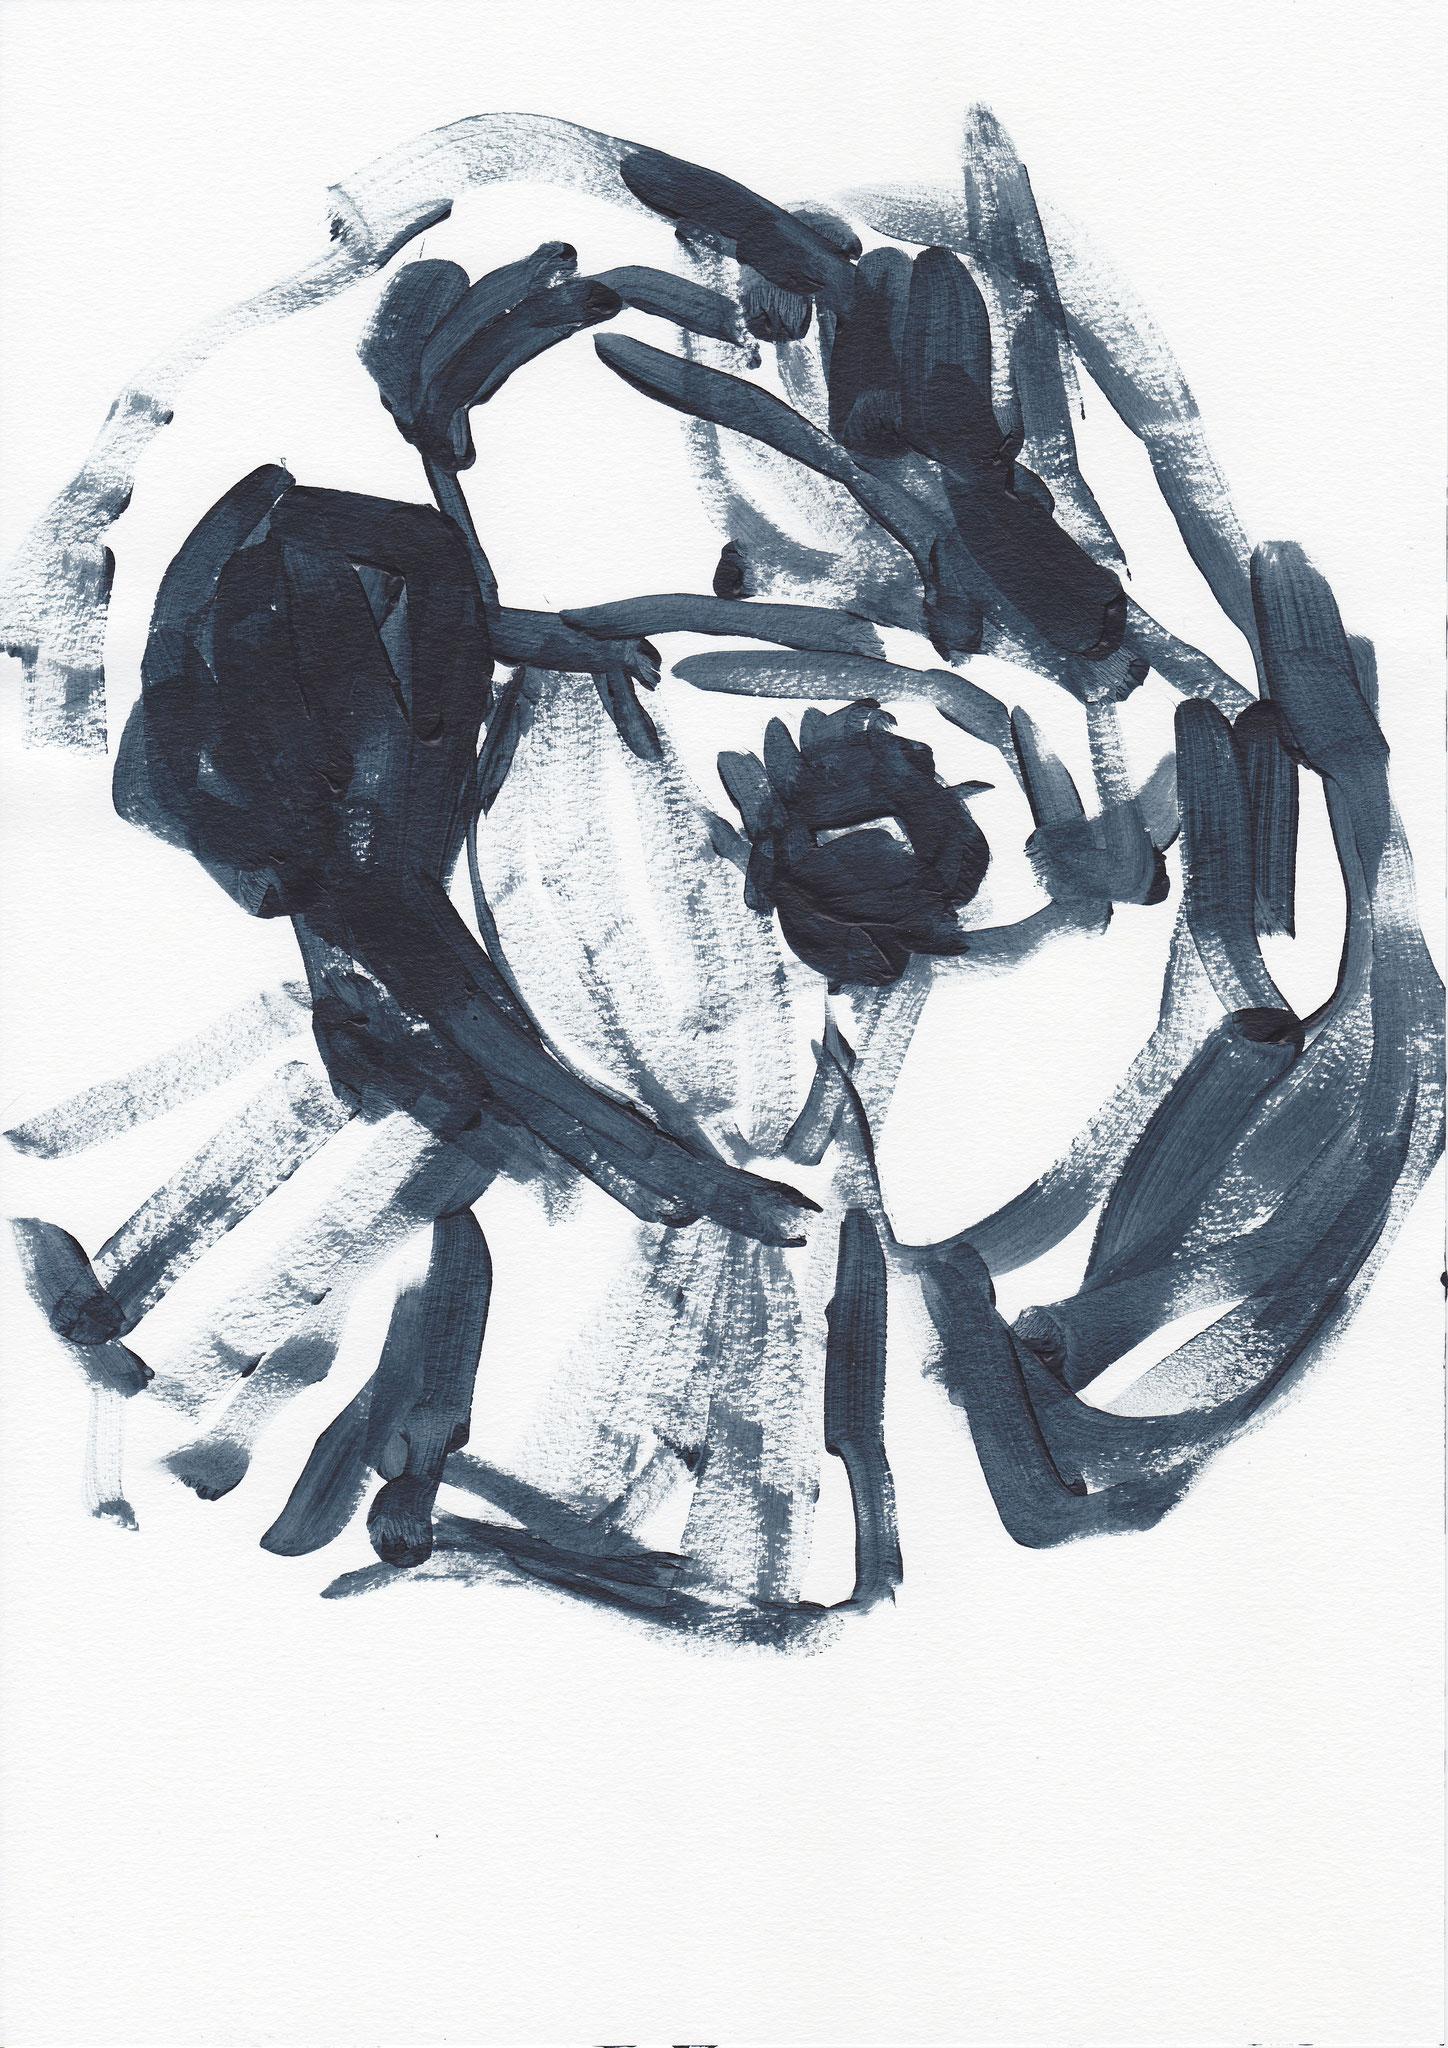 072 , acrylic on paper , 29.7 x 21cm , Selina Saranova